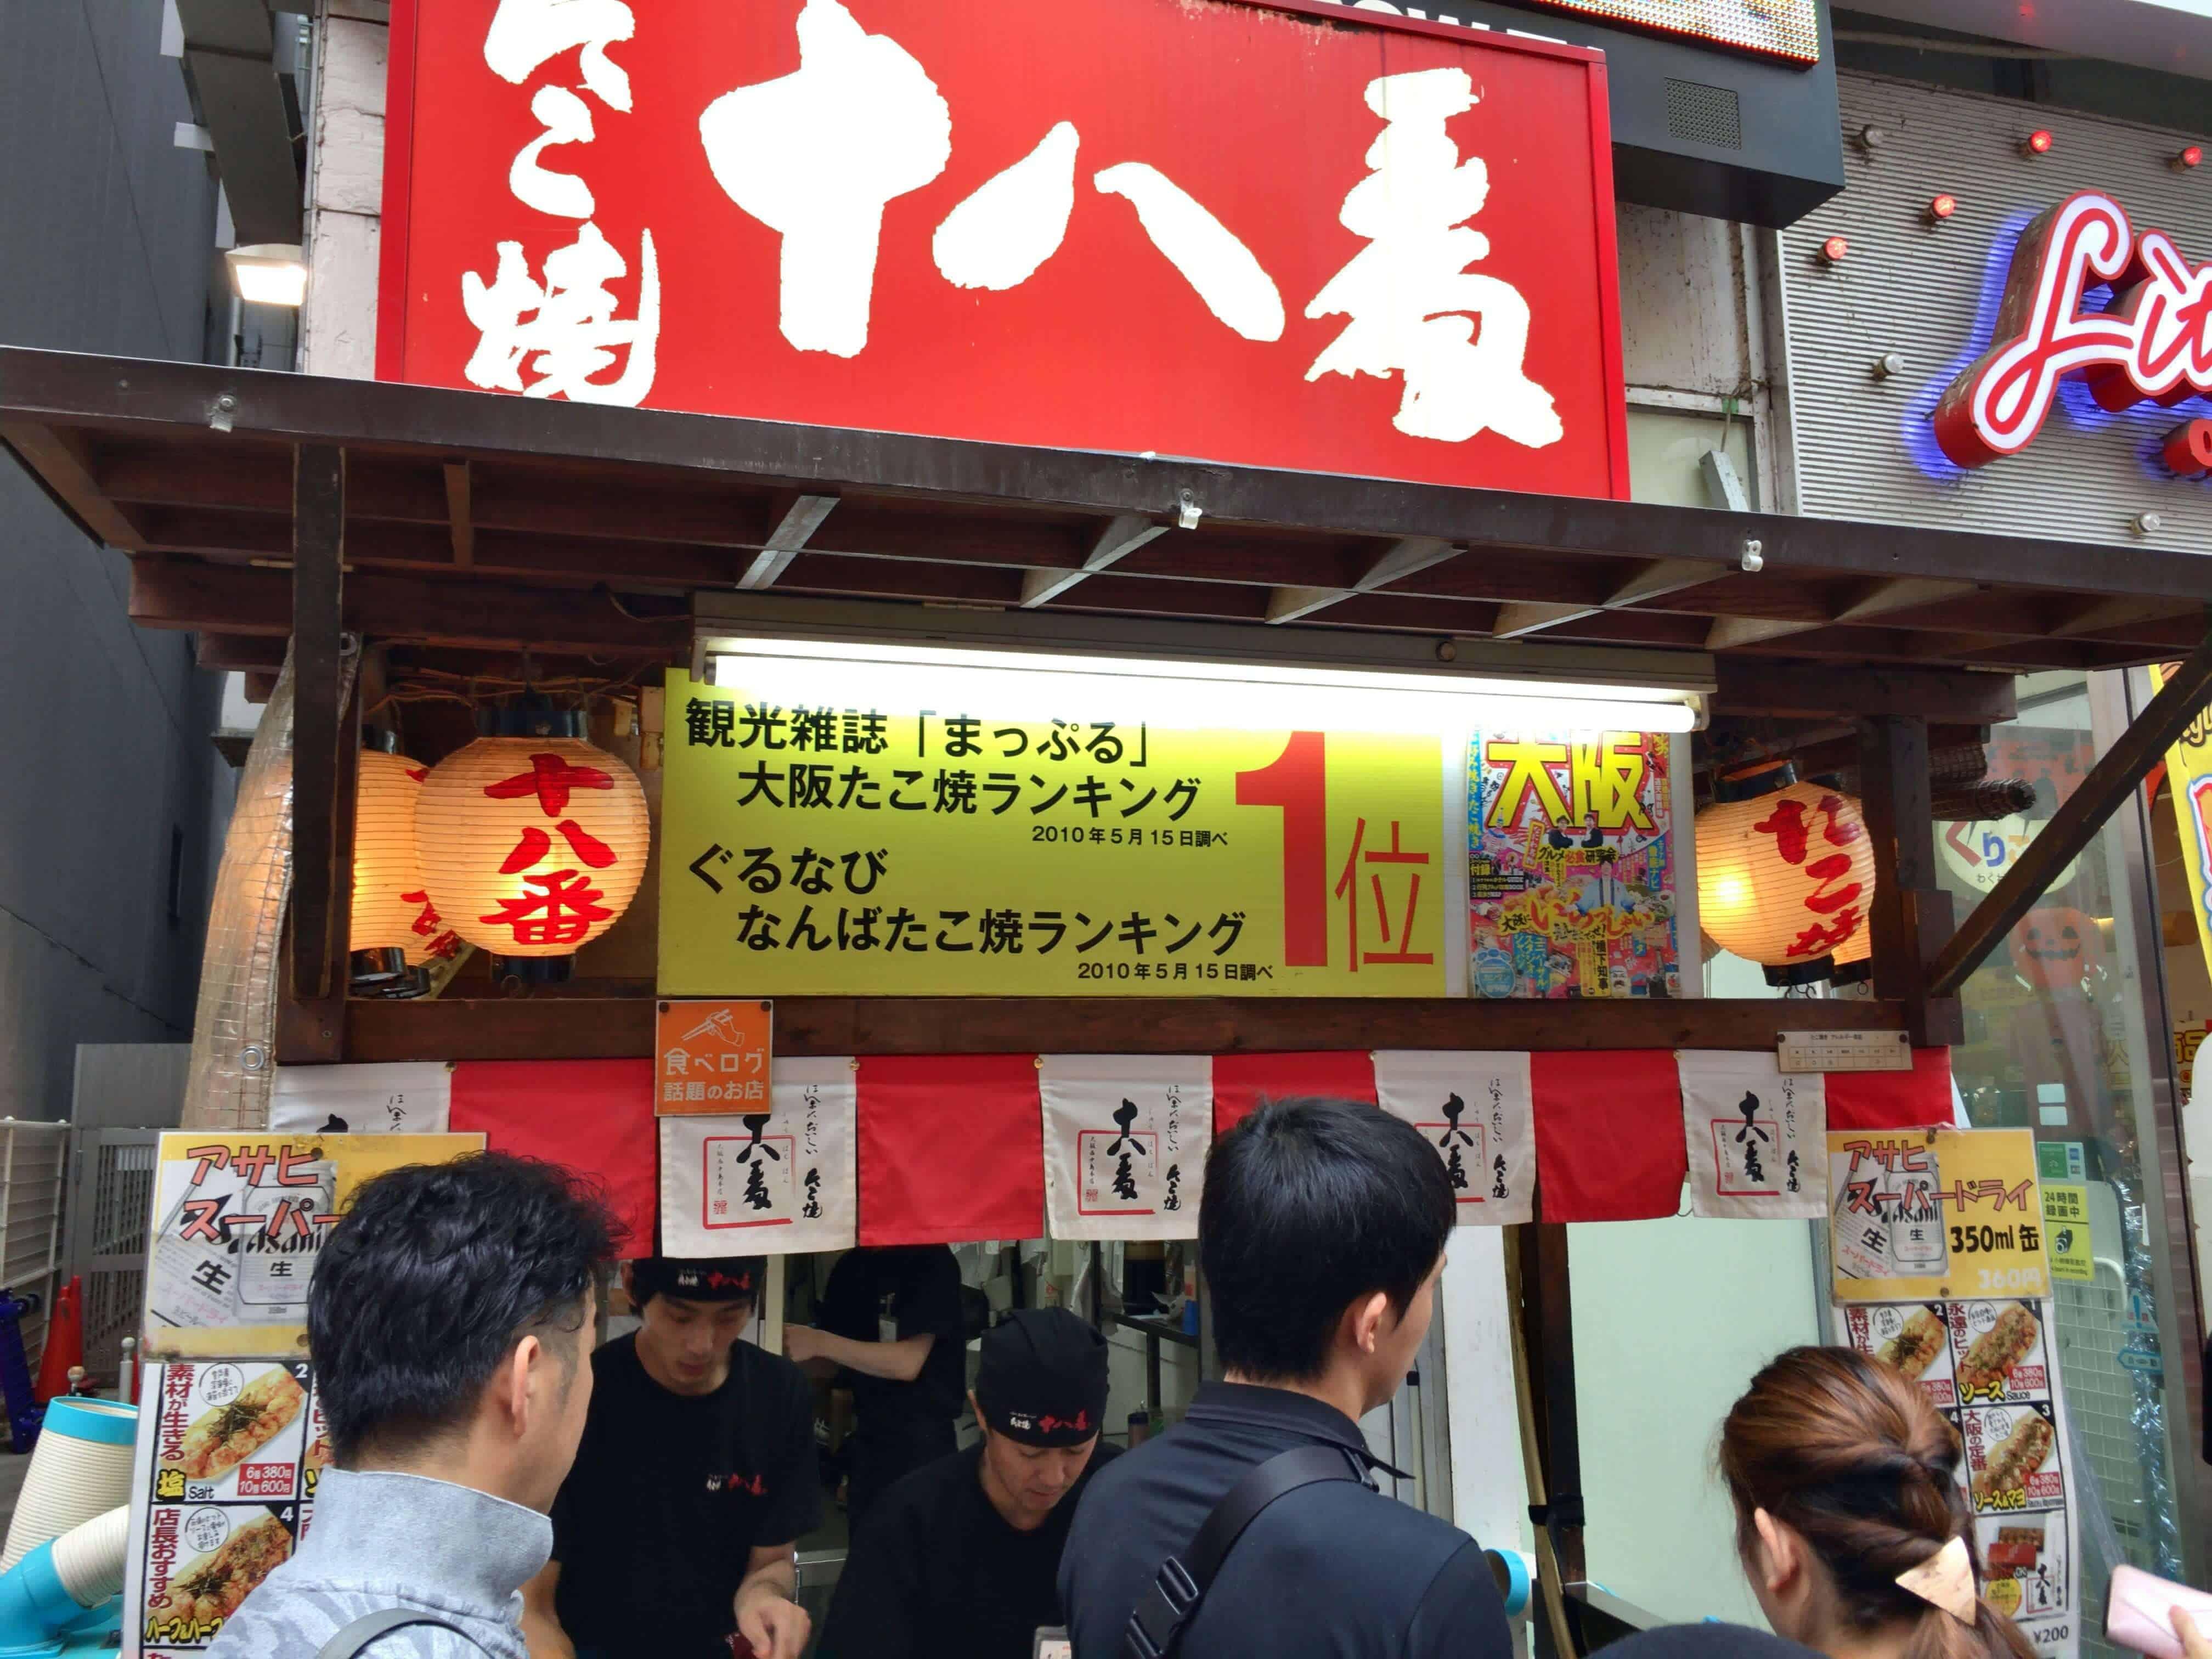 Takoyaki Juhachiban Dotonbori ร้านทาโกยากิ ย่านดงบุริ โอซาก้า